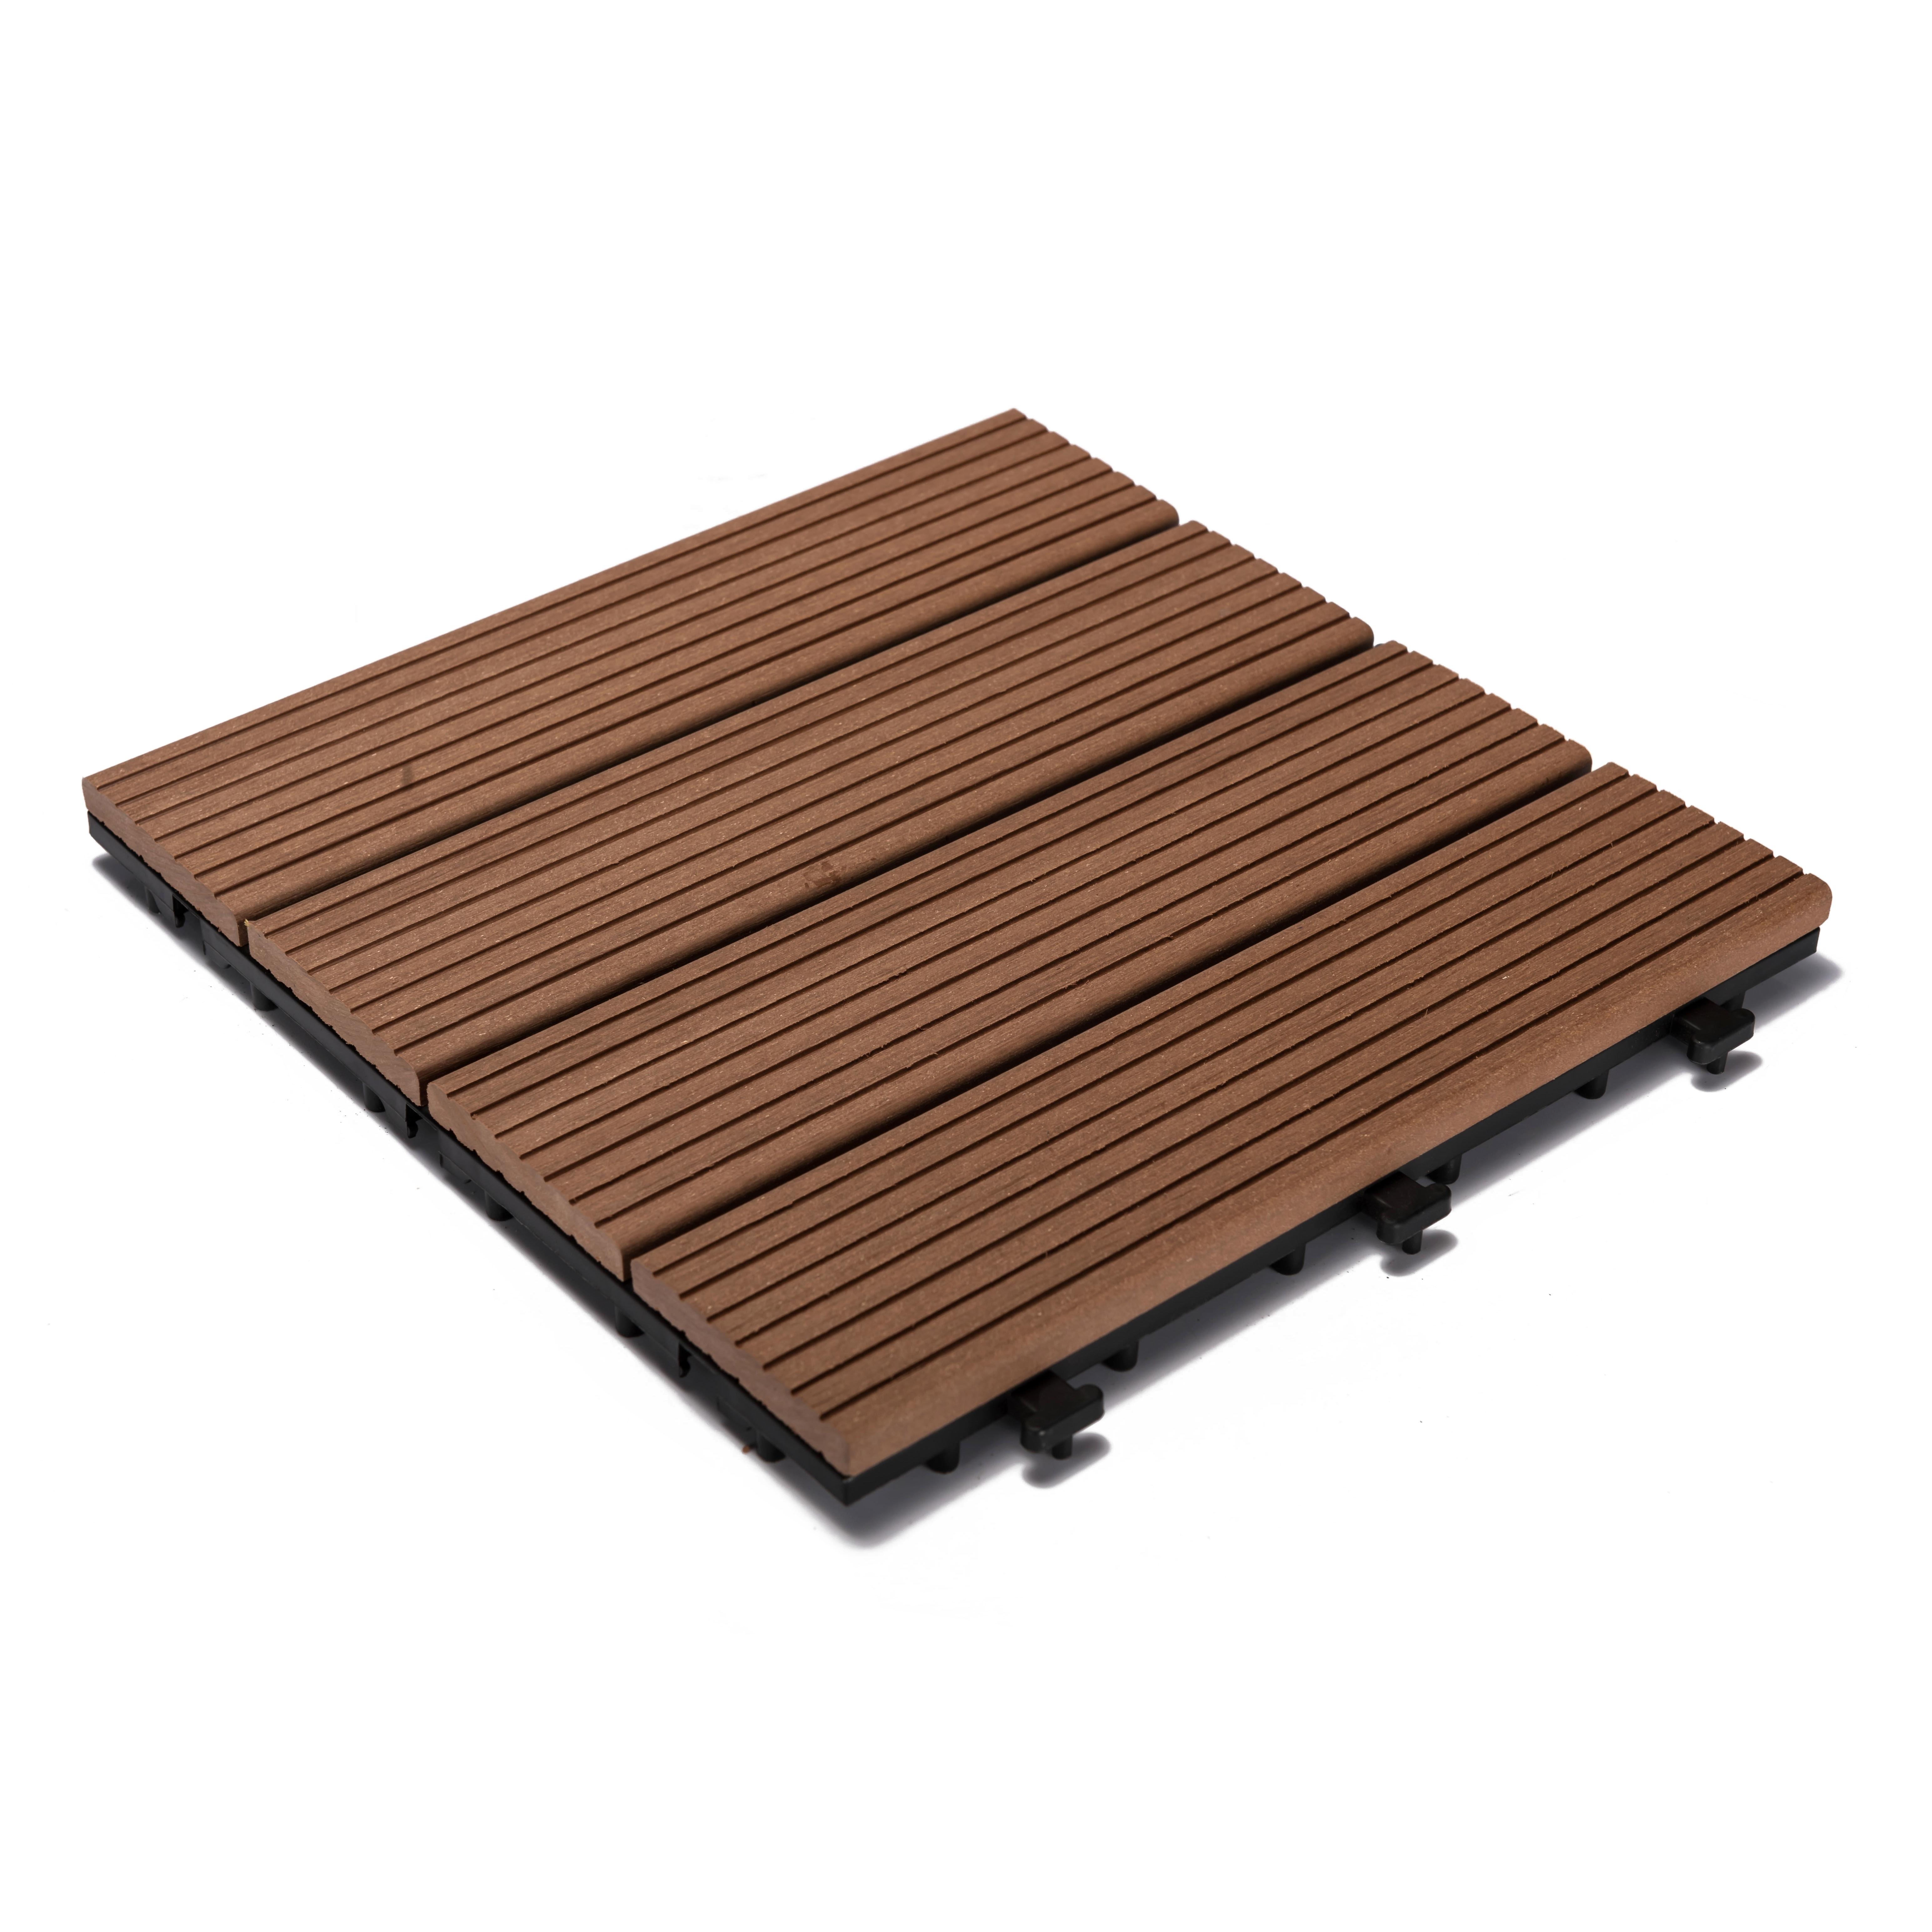 "Brown / 12""x12""x1"" Interlocking Deck Tiles - WPC series - 12""x12""x1"" 0"